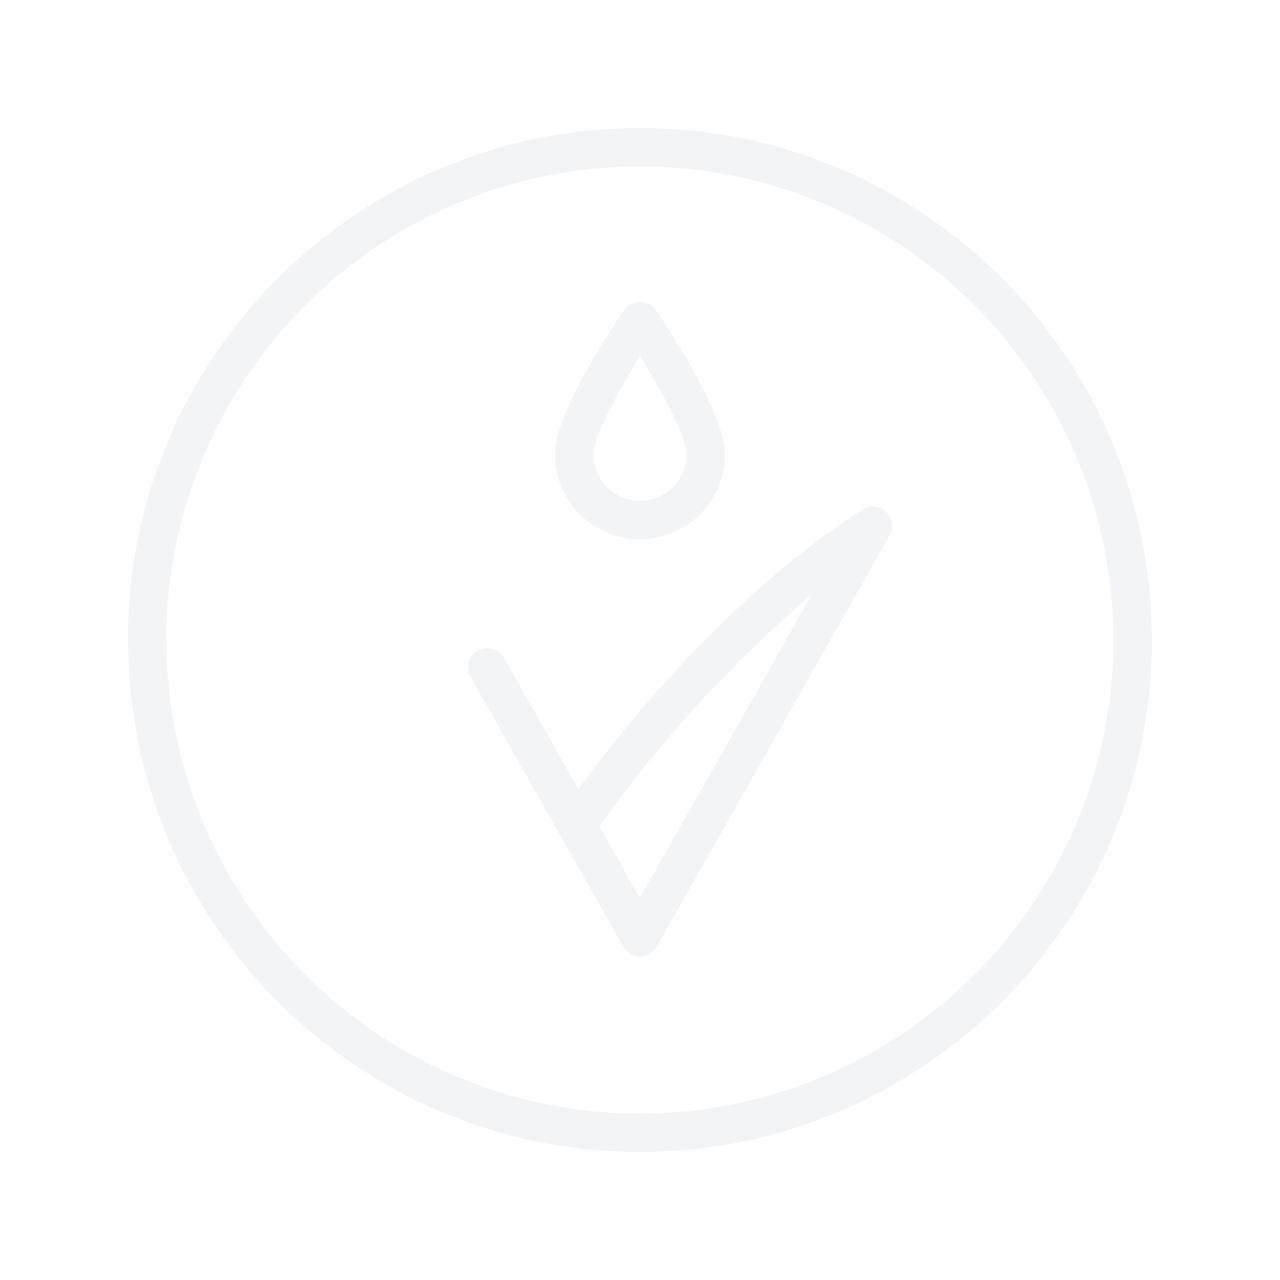 MAYBELLINE Color Sensational Matte Lipstick No.983 Beige Babe 3.9g